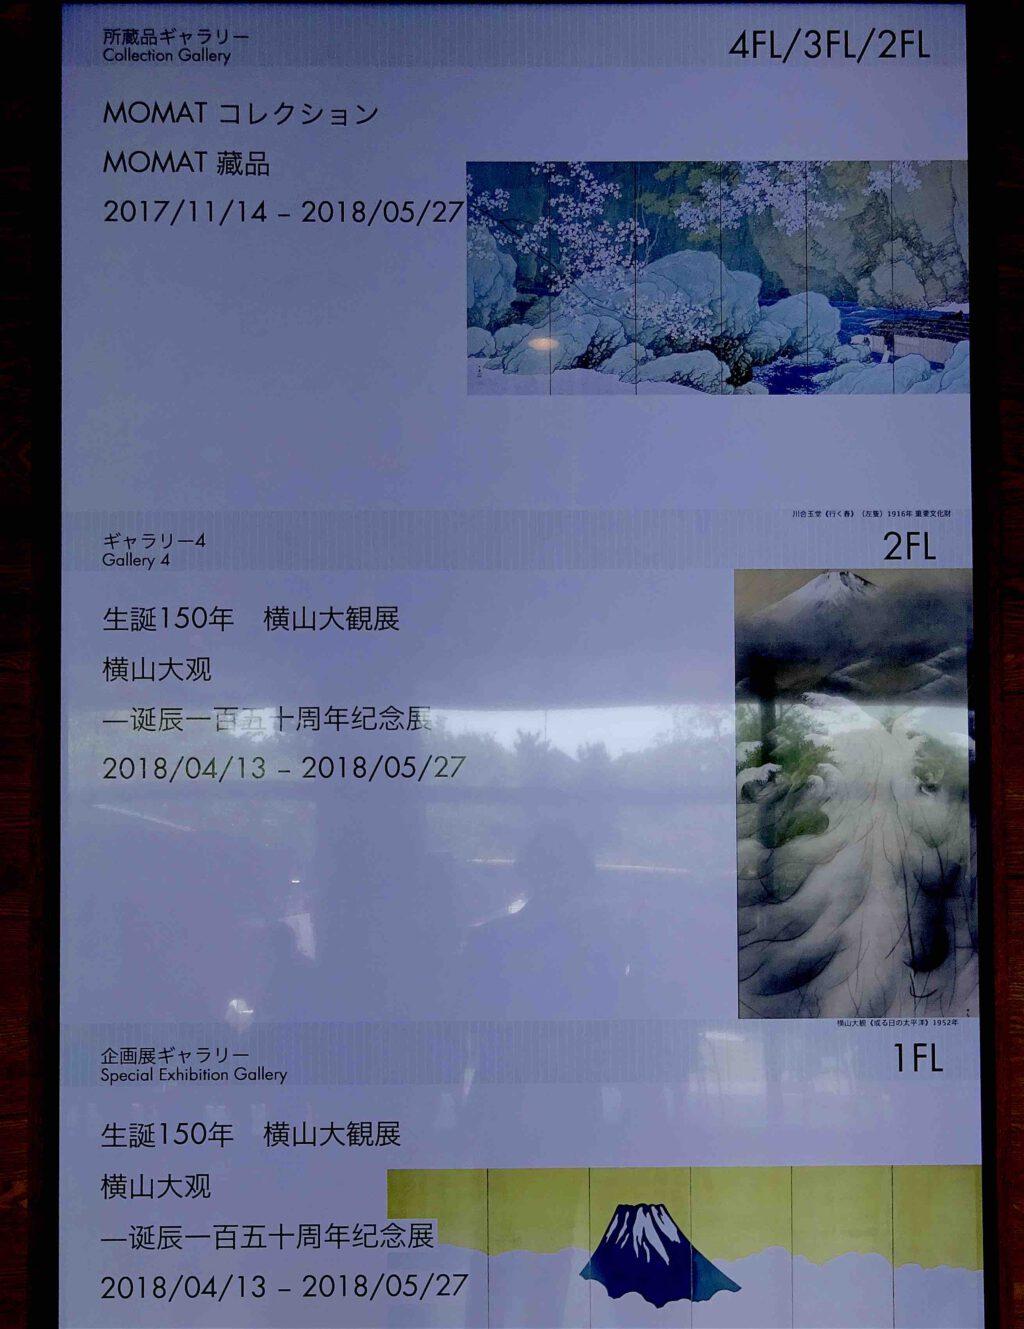 横山大観展 YOKOYAMA TAIKAN @ 東京国立近代美術館 The National Museum of Modern Art, Tokyo, MOMAT 案内